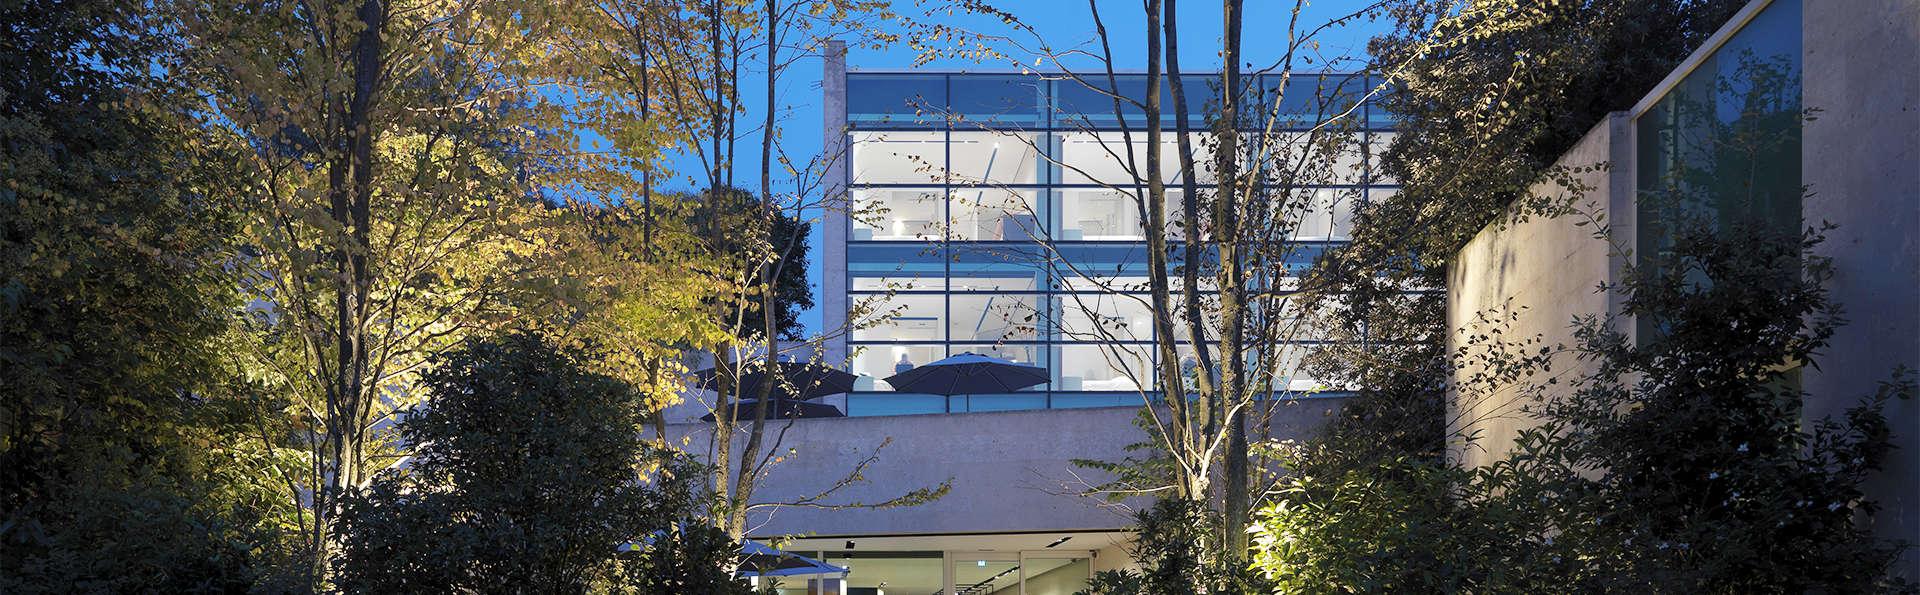 Hôtel au design minimaliste en Brianza